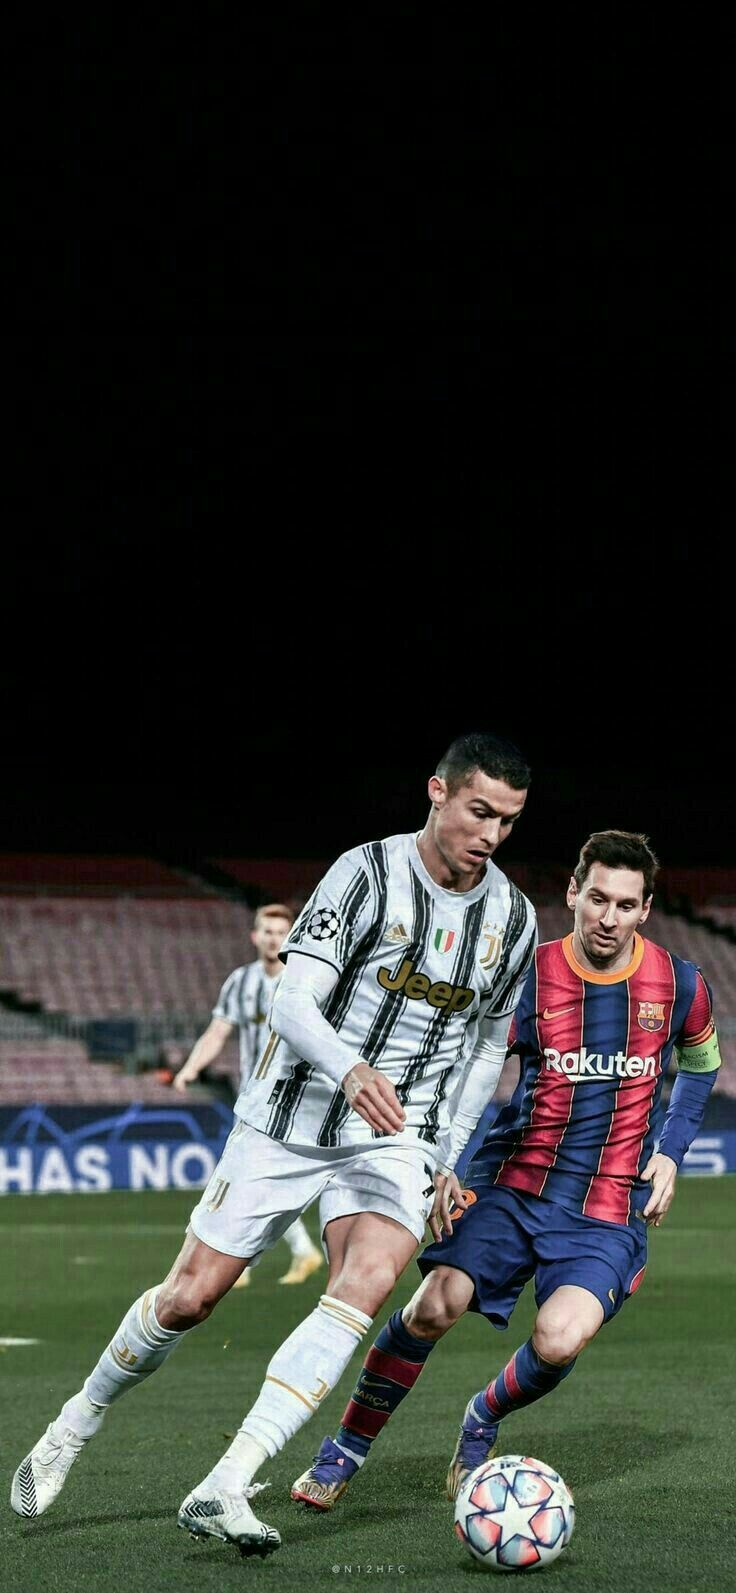 C Ronaldo L Messi Together In 2021 Messi Vs Ronaldo Messi And Ronaldo Cristiano Ronaldo And Messi